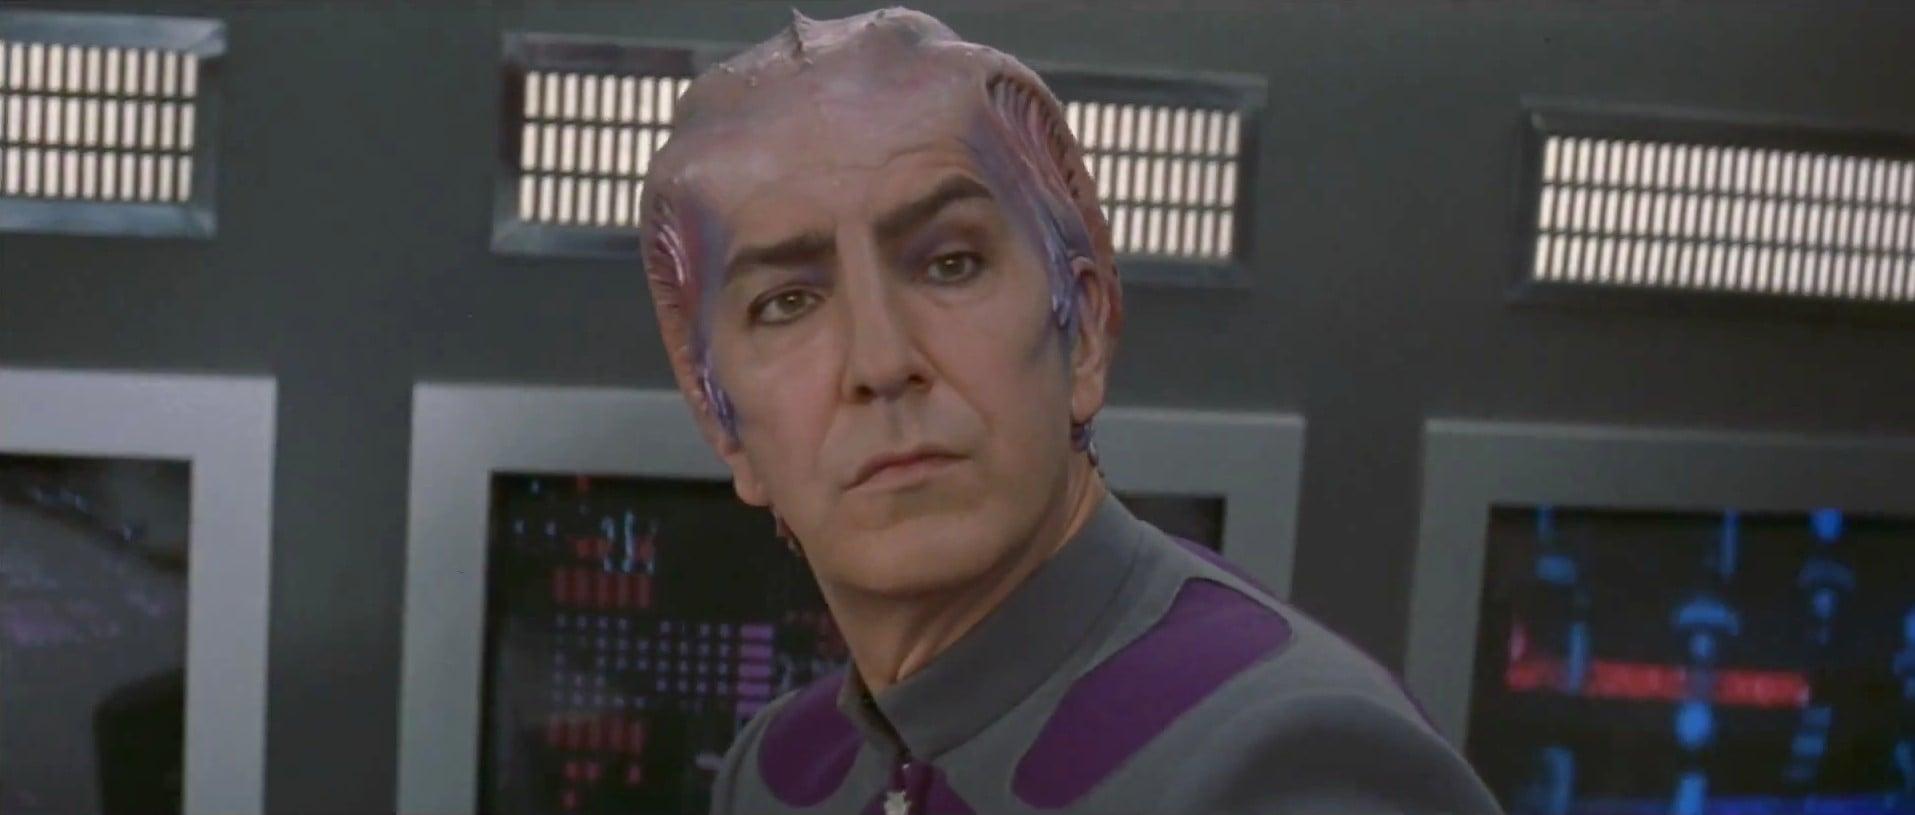 in Galaxy Quest (1999)